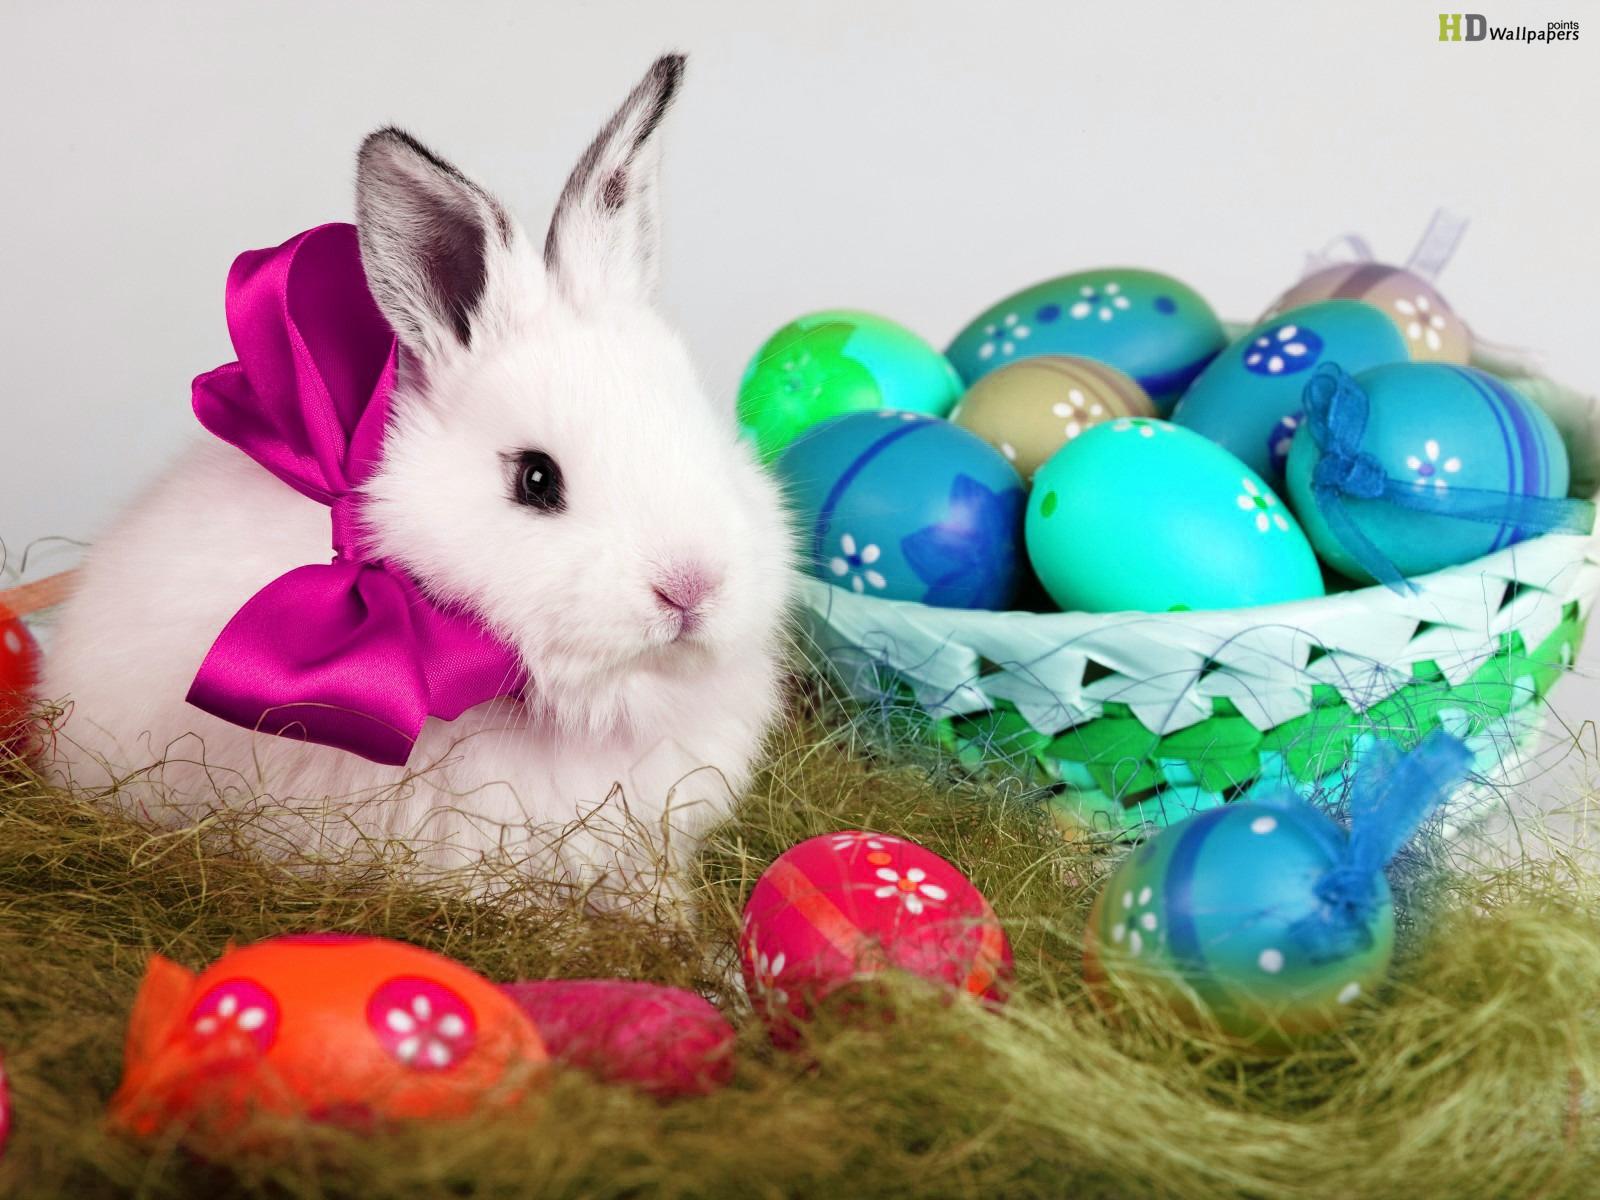 Cute Bunny image Wallpaper Beautiful Sweat Rabbits Picture HD 1600x1200